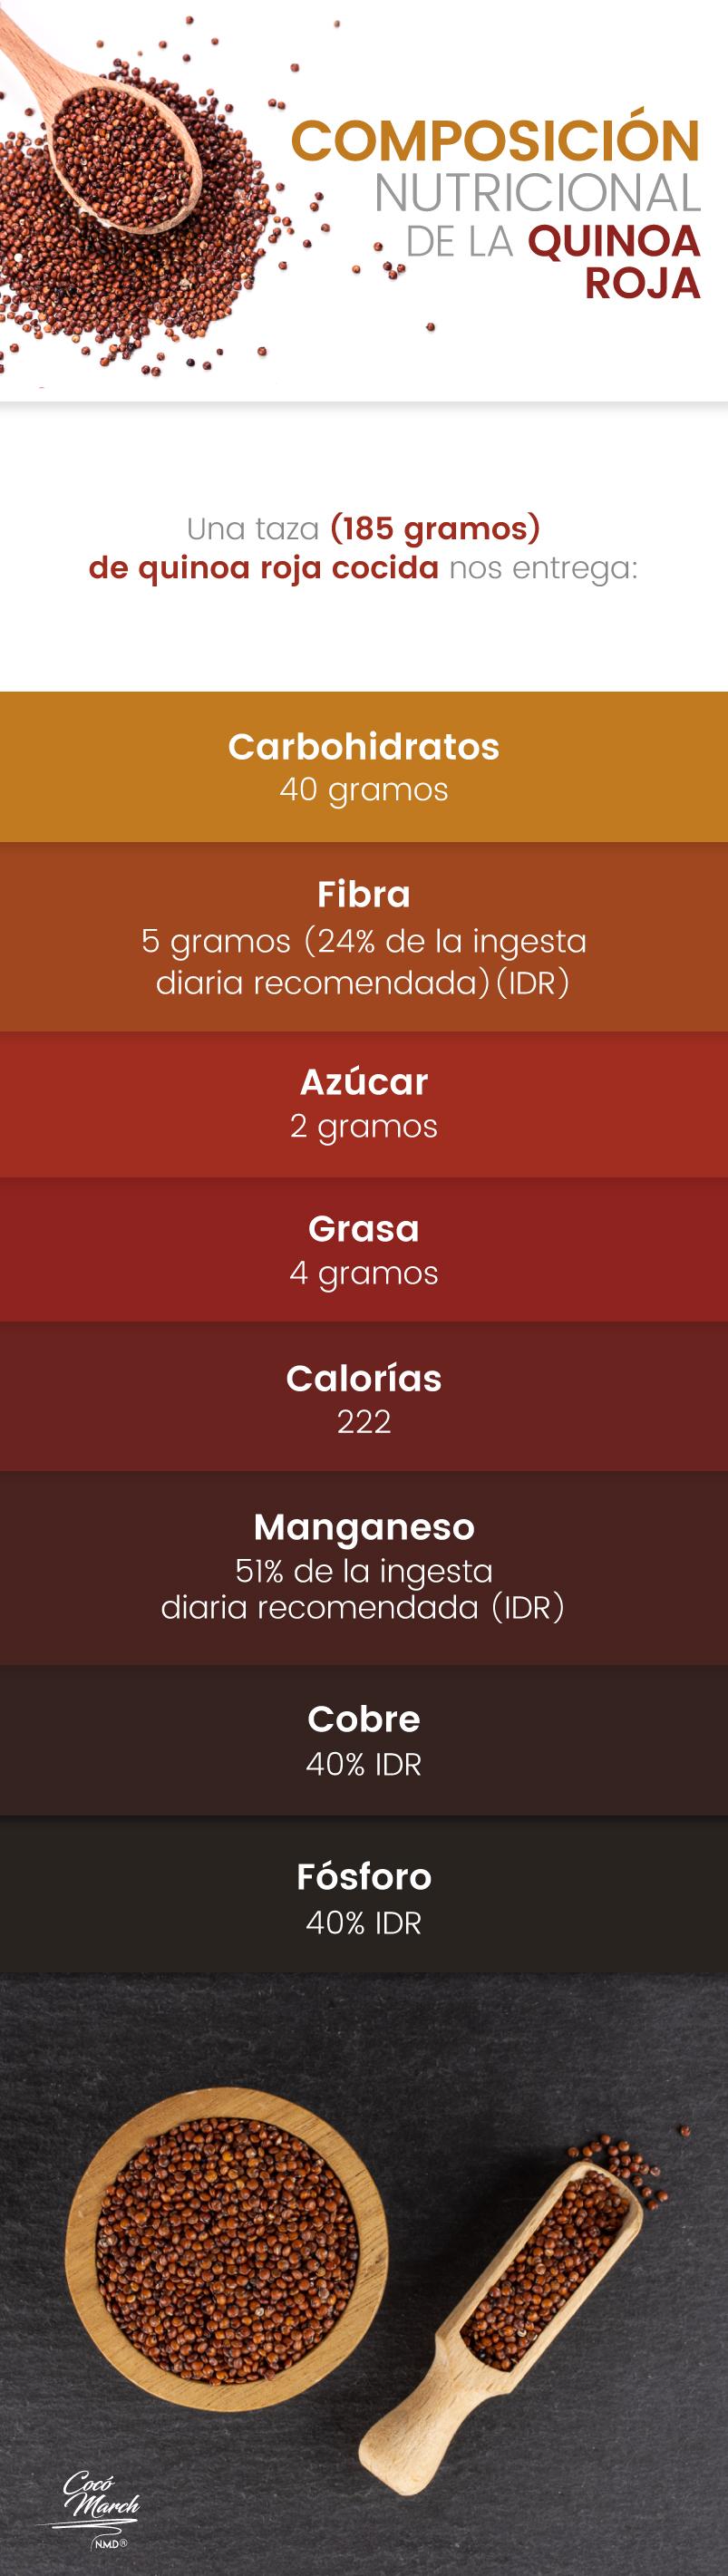 quinoa-roja-composicion-nutricional